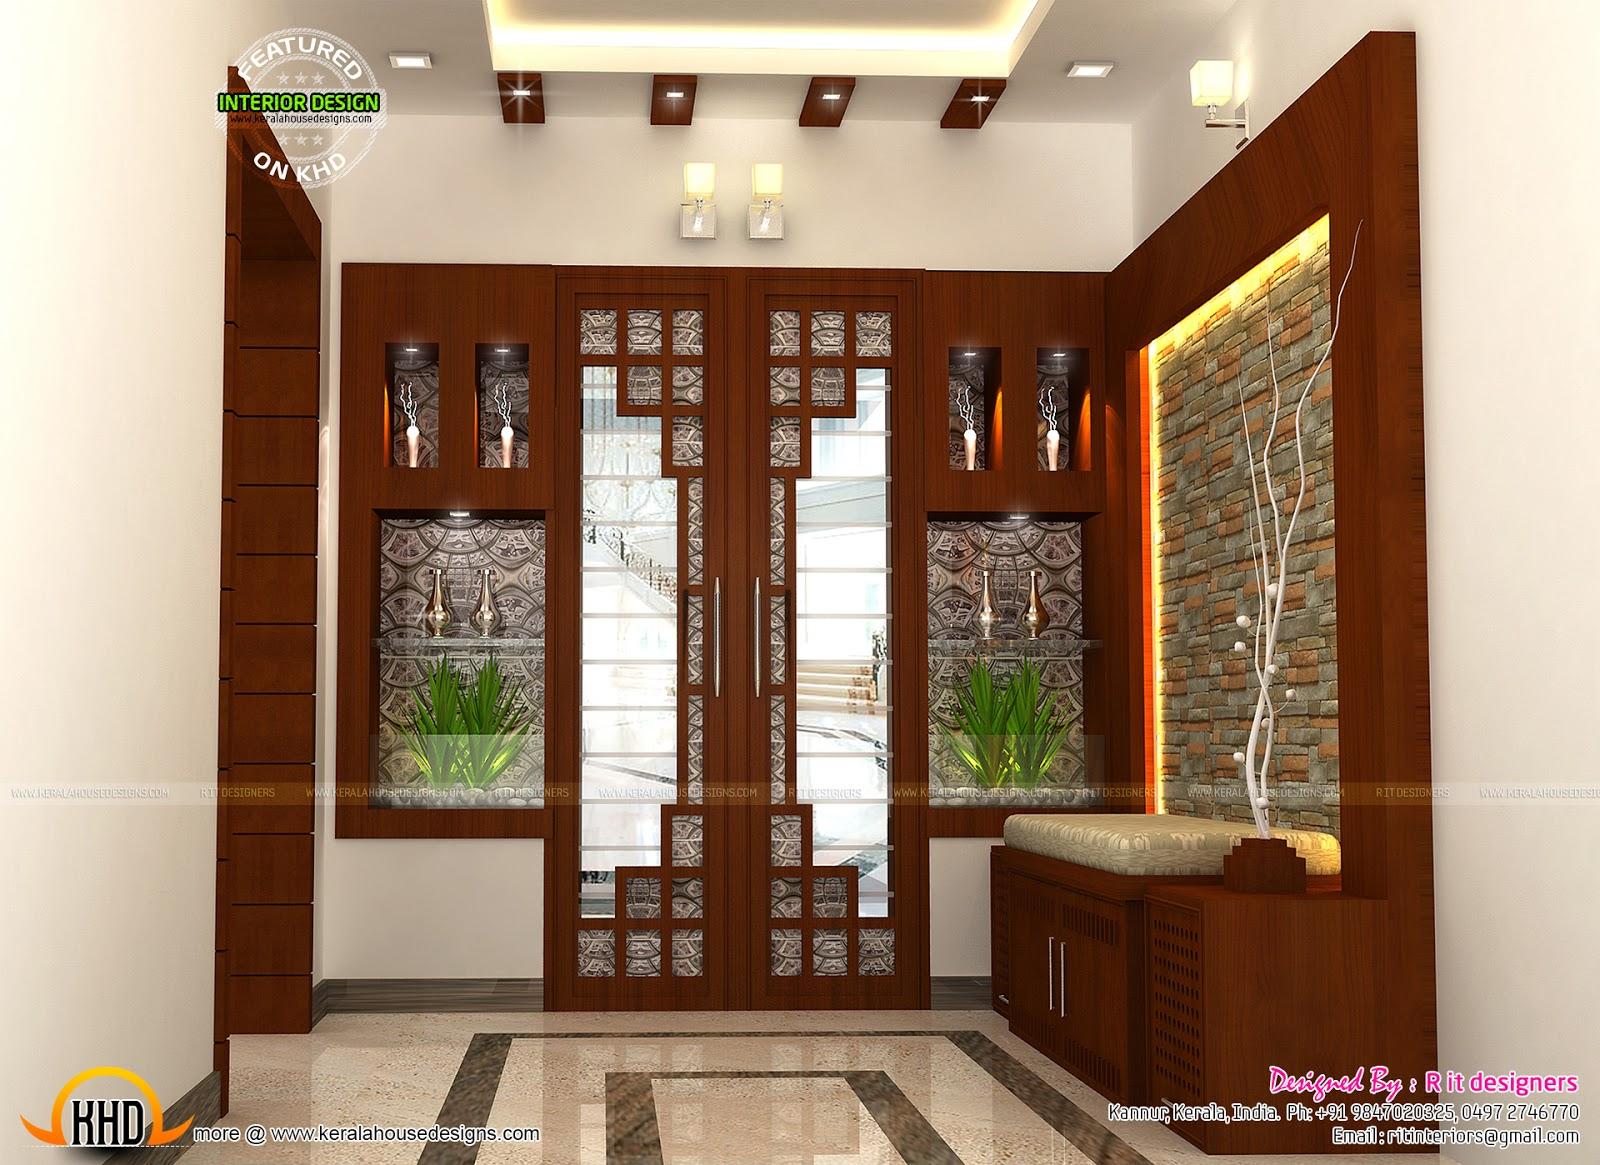 kerala house interior design ideas rh mainesbestchoice com